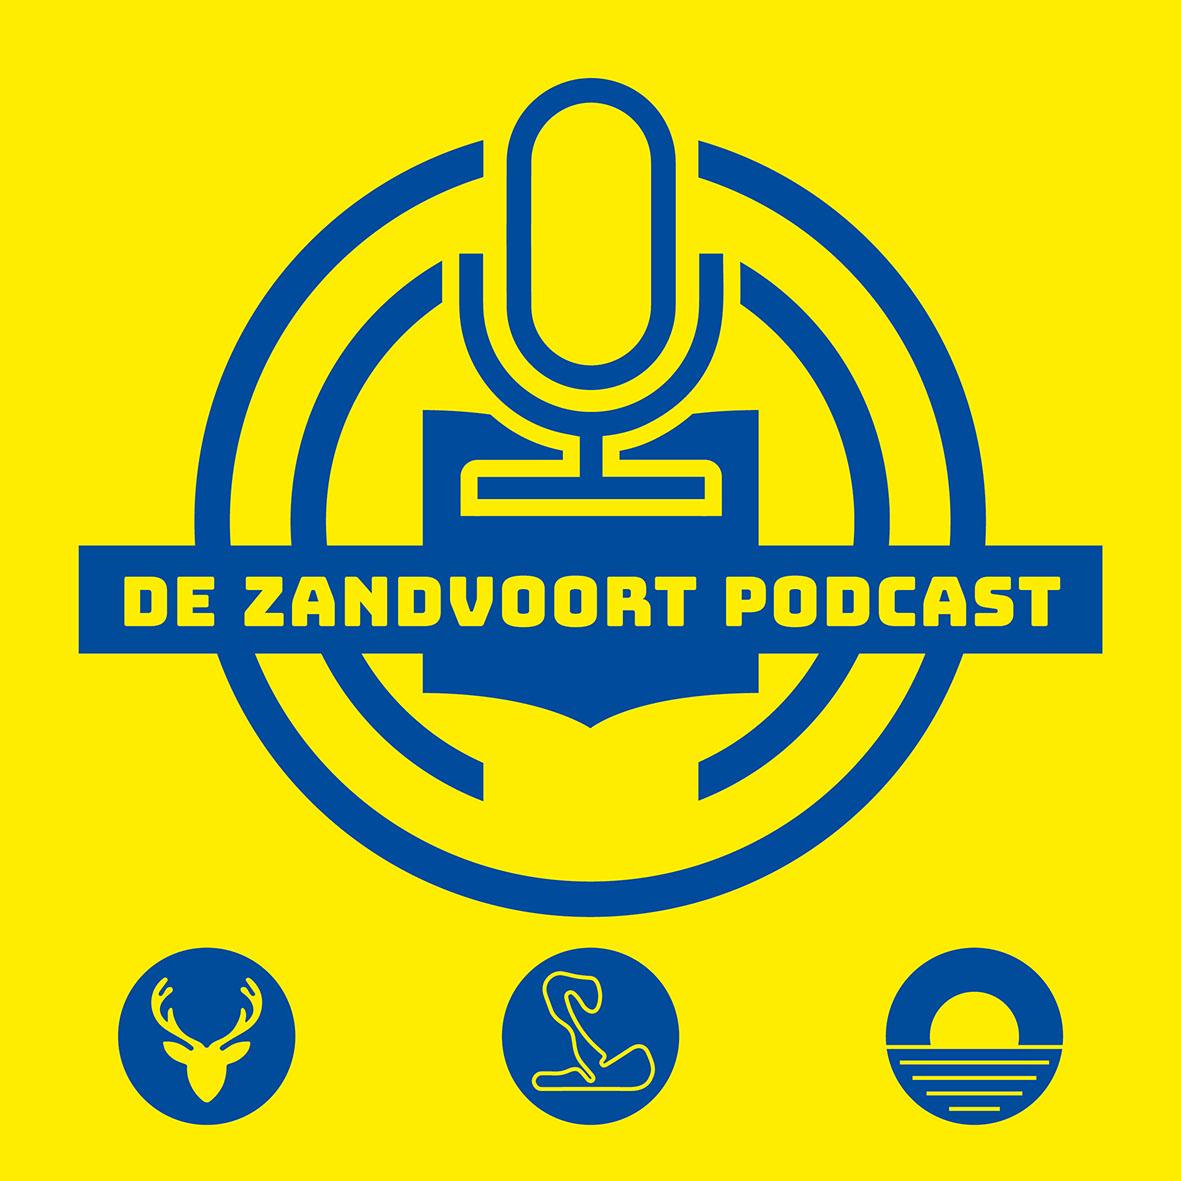 De Zandvoort Podcast